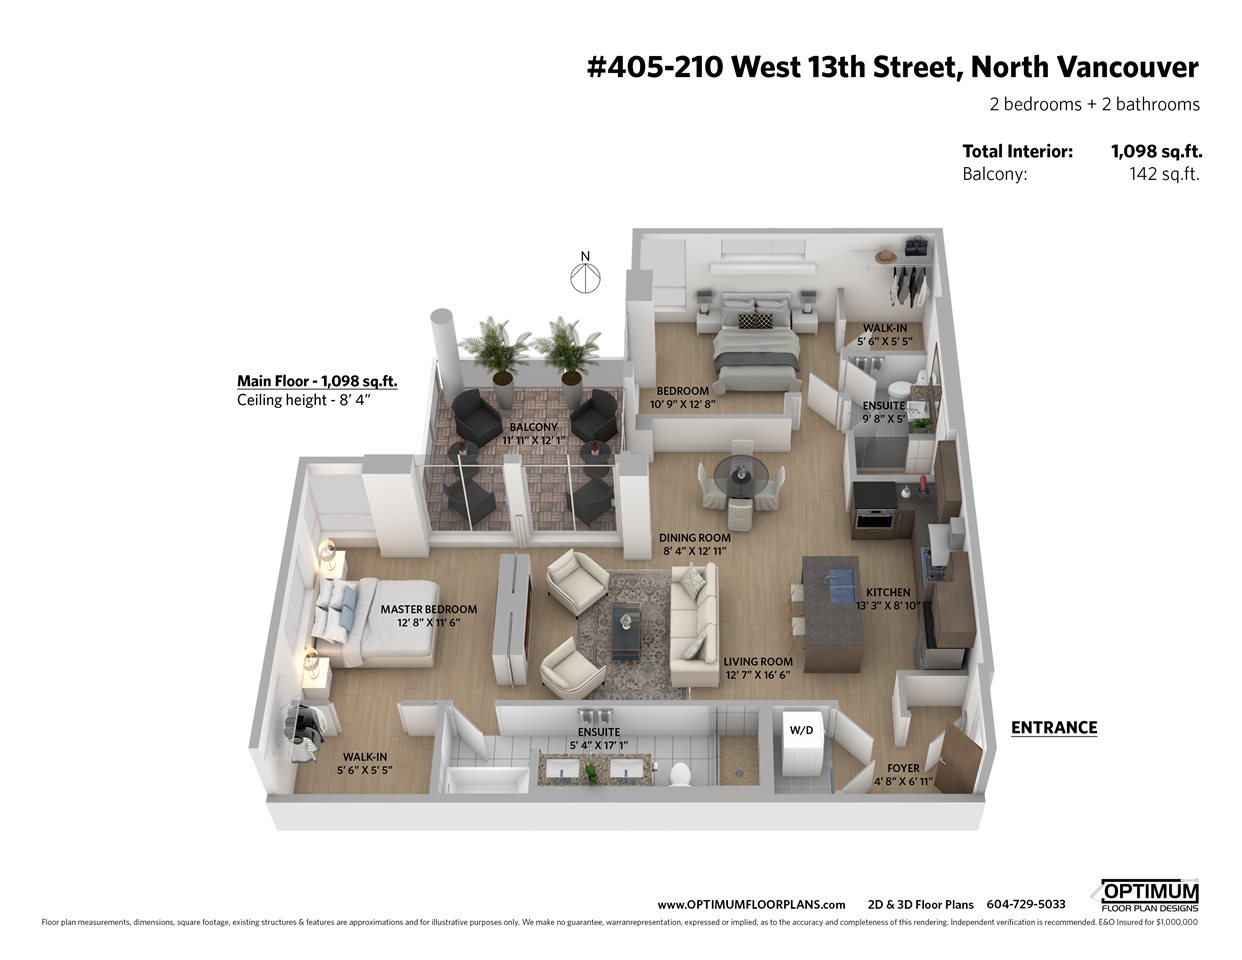 Listing Image of 405 210 W 13TH STREET